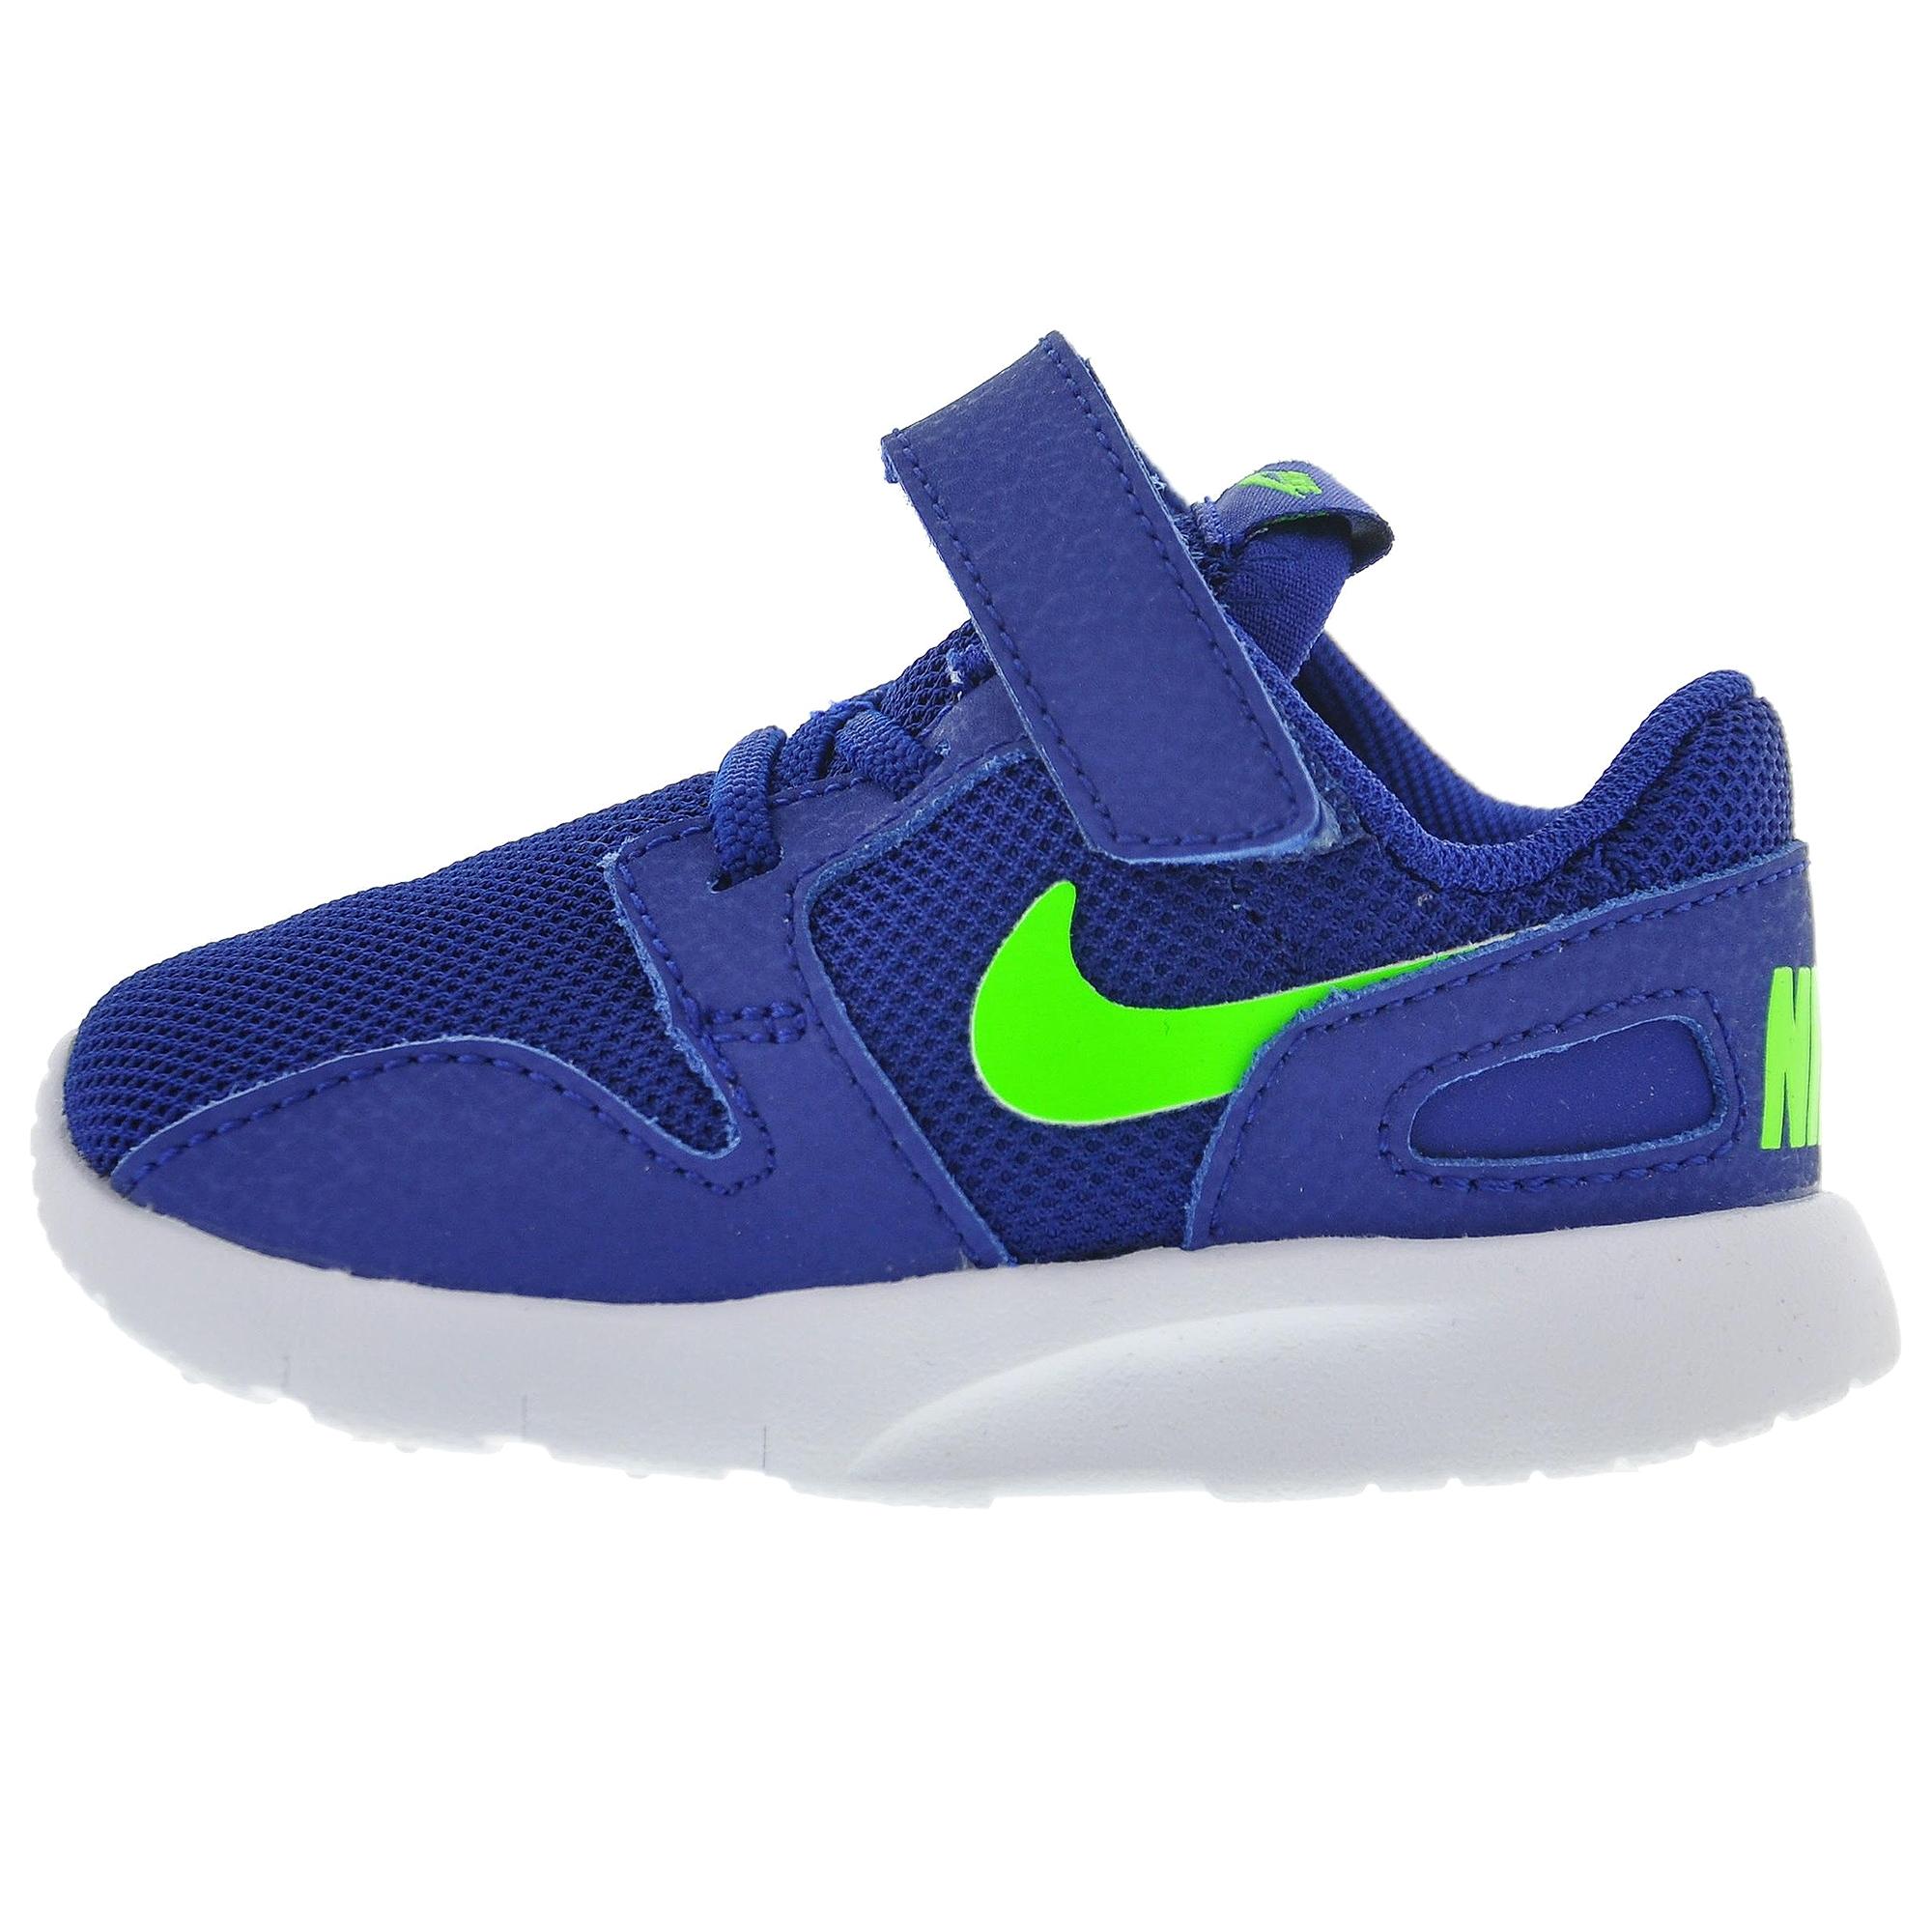 cheap for discount c124a 299ba Nike Kaishi (Tdv) Çocuk Spor Ayakkabı